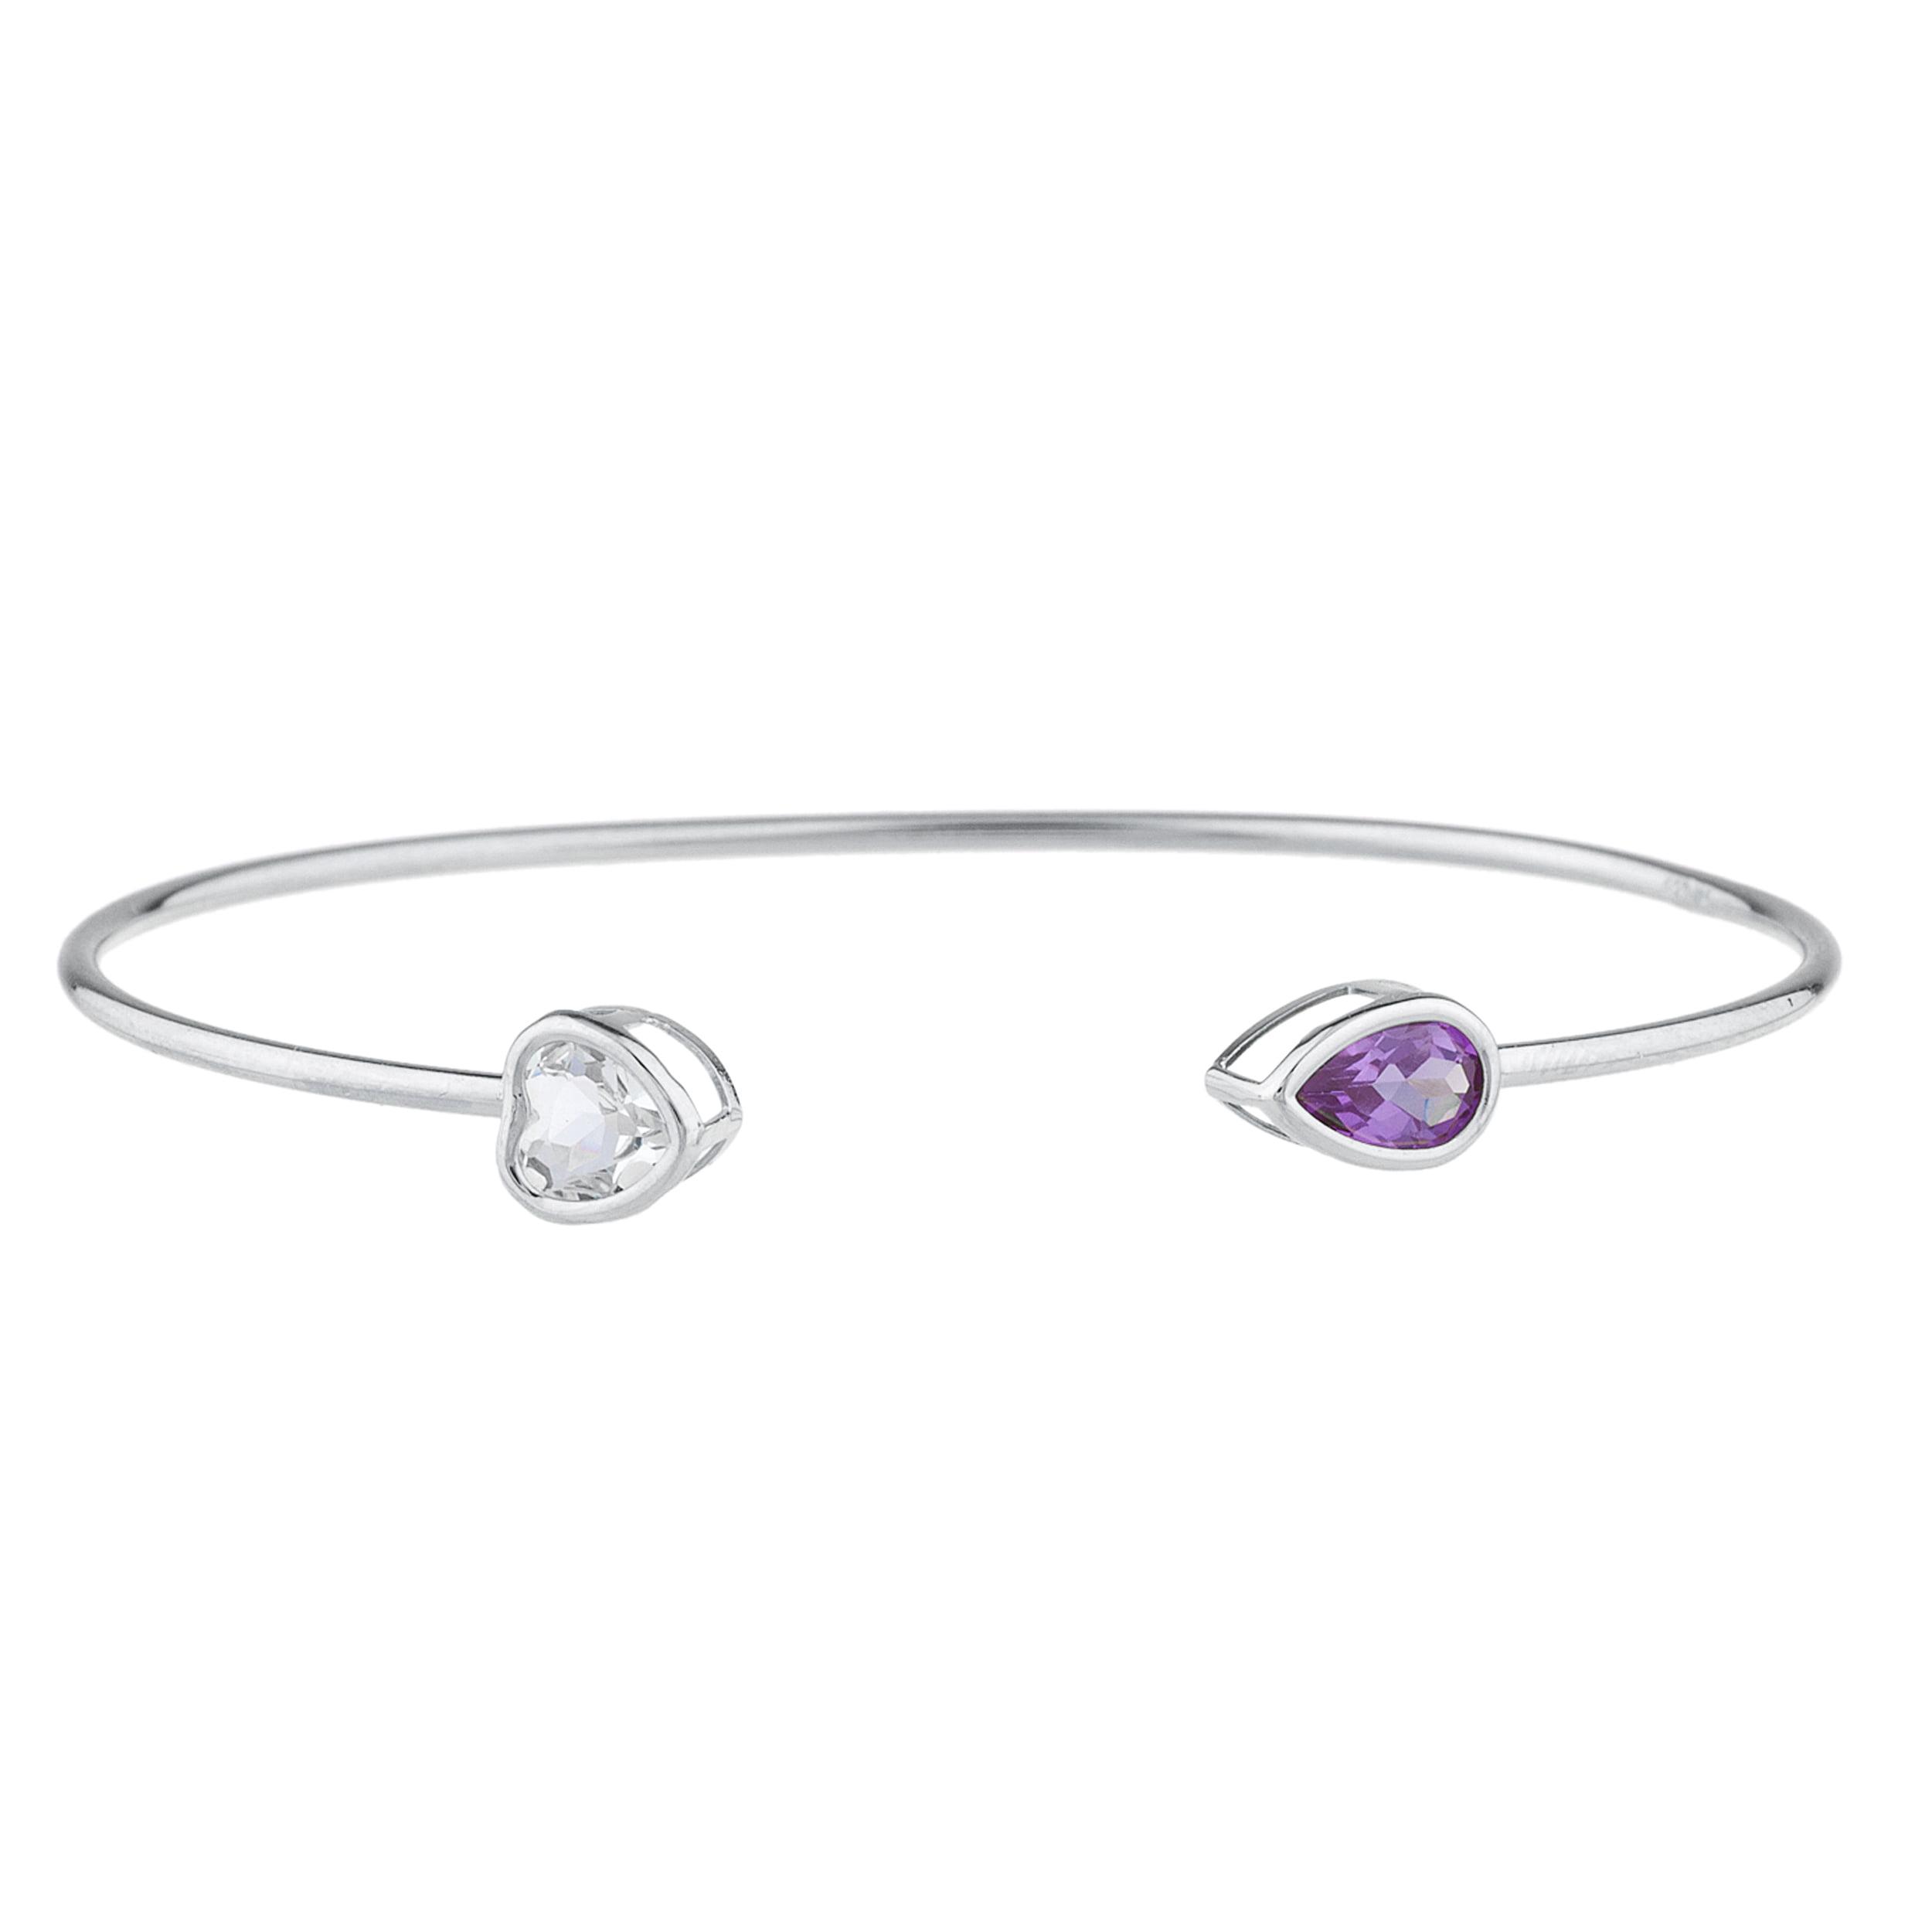 Genuine Aquamarine Heart & Alexandrite Pear Bezel Bangle Bracelet .925 Sterling Silver Rhodium Finish by Elizabeth Jewelry Inc